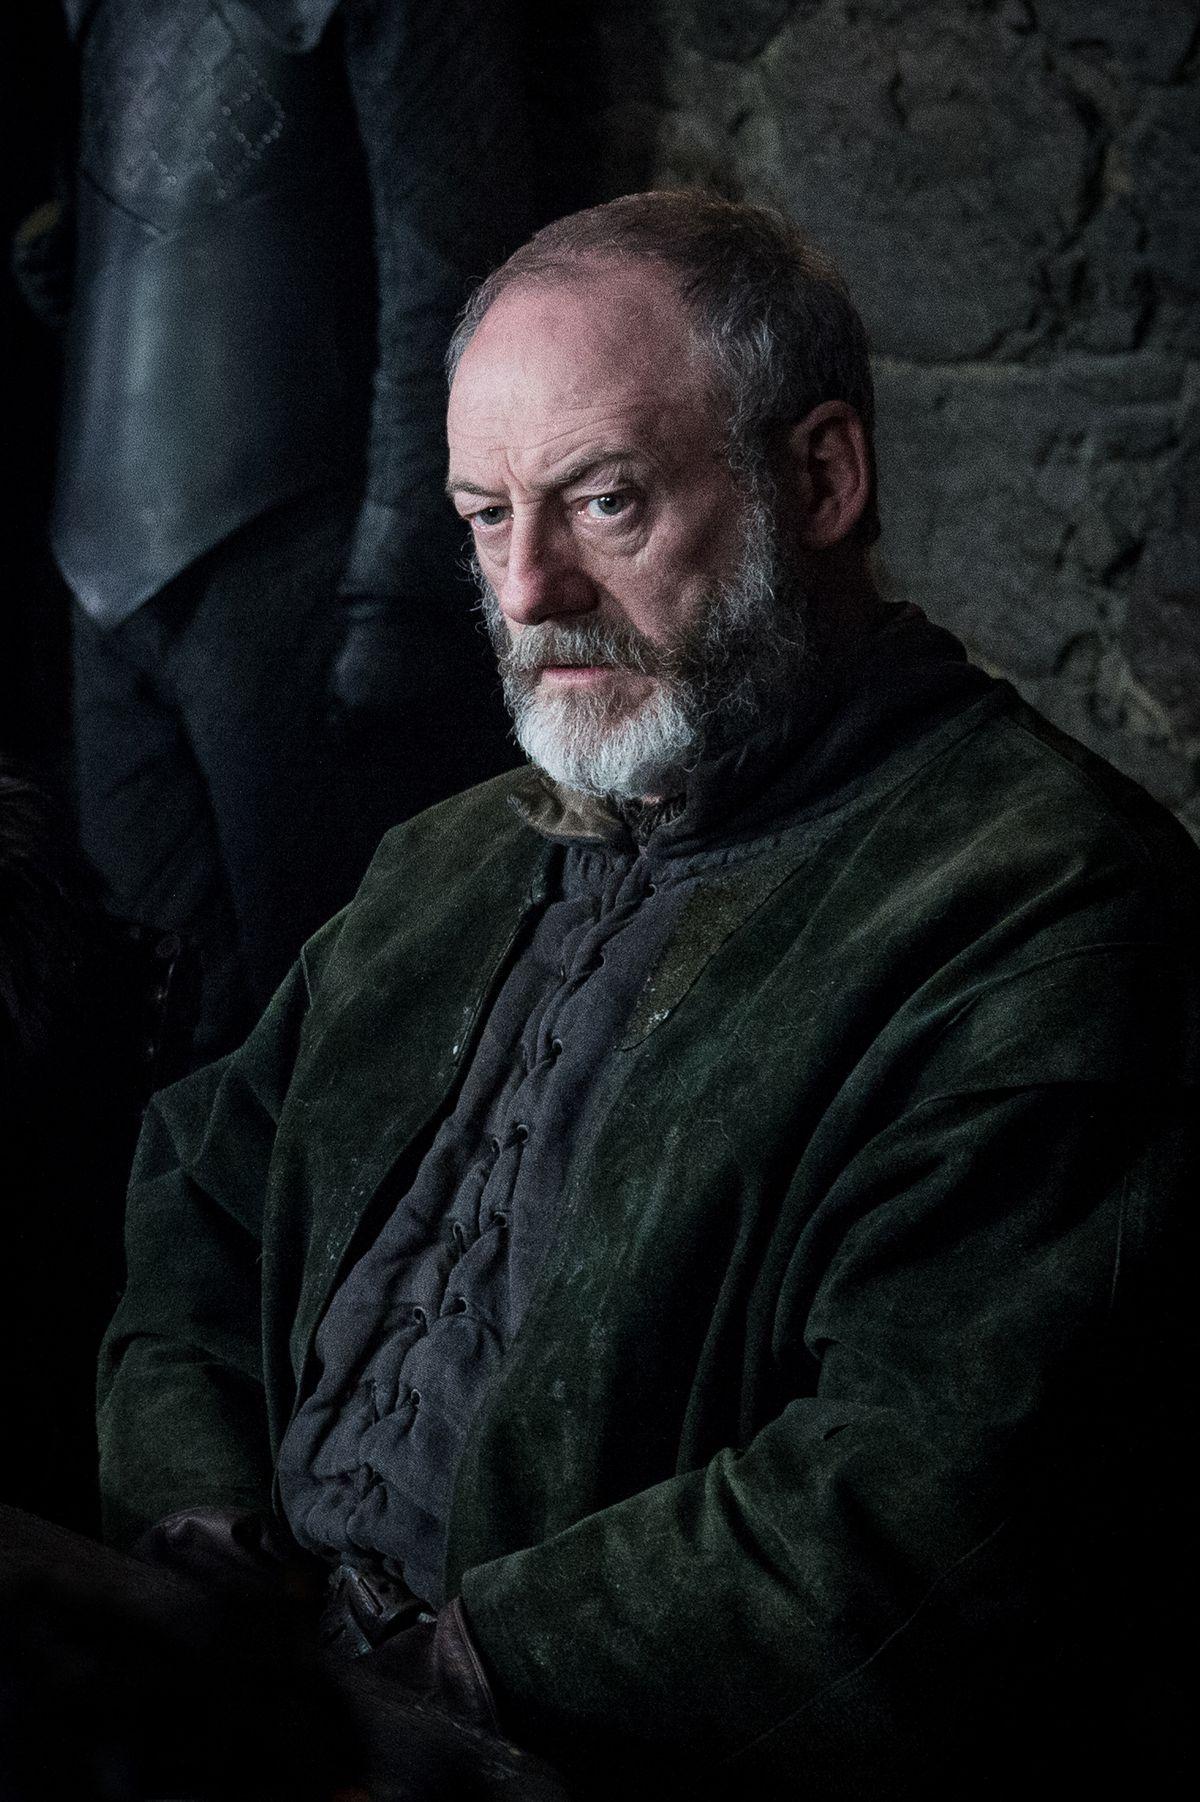 Game of Thrones season 8 - Davos Seaworth